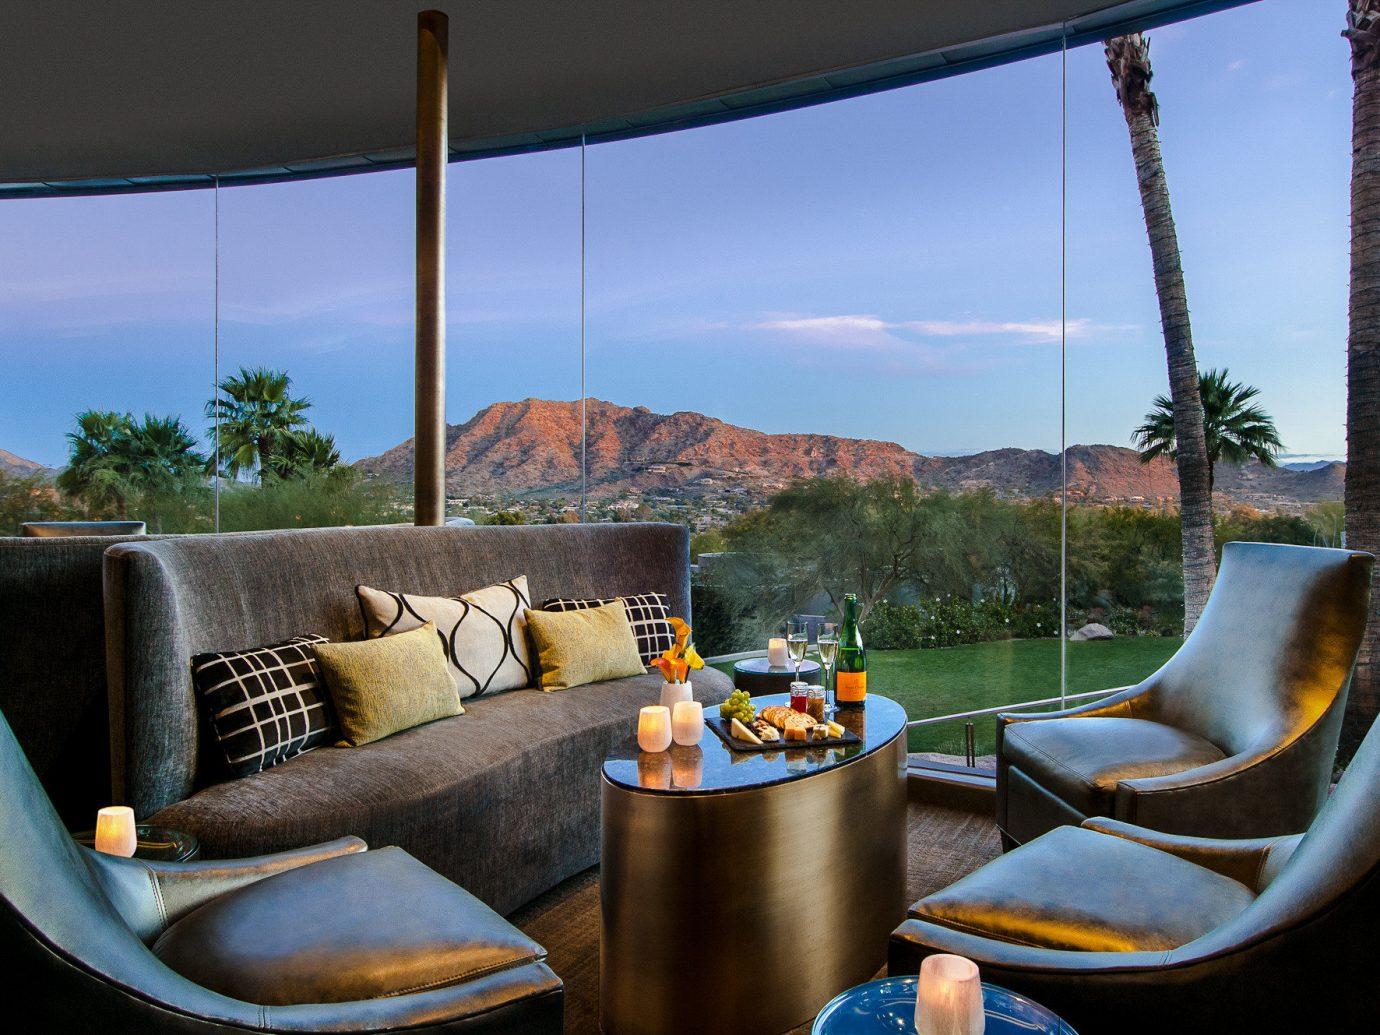 Interior of Elements, Scottsdale, Arizona